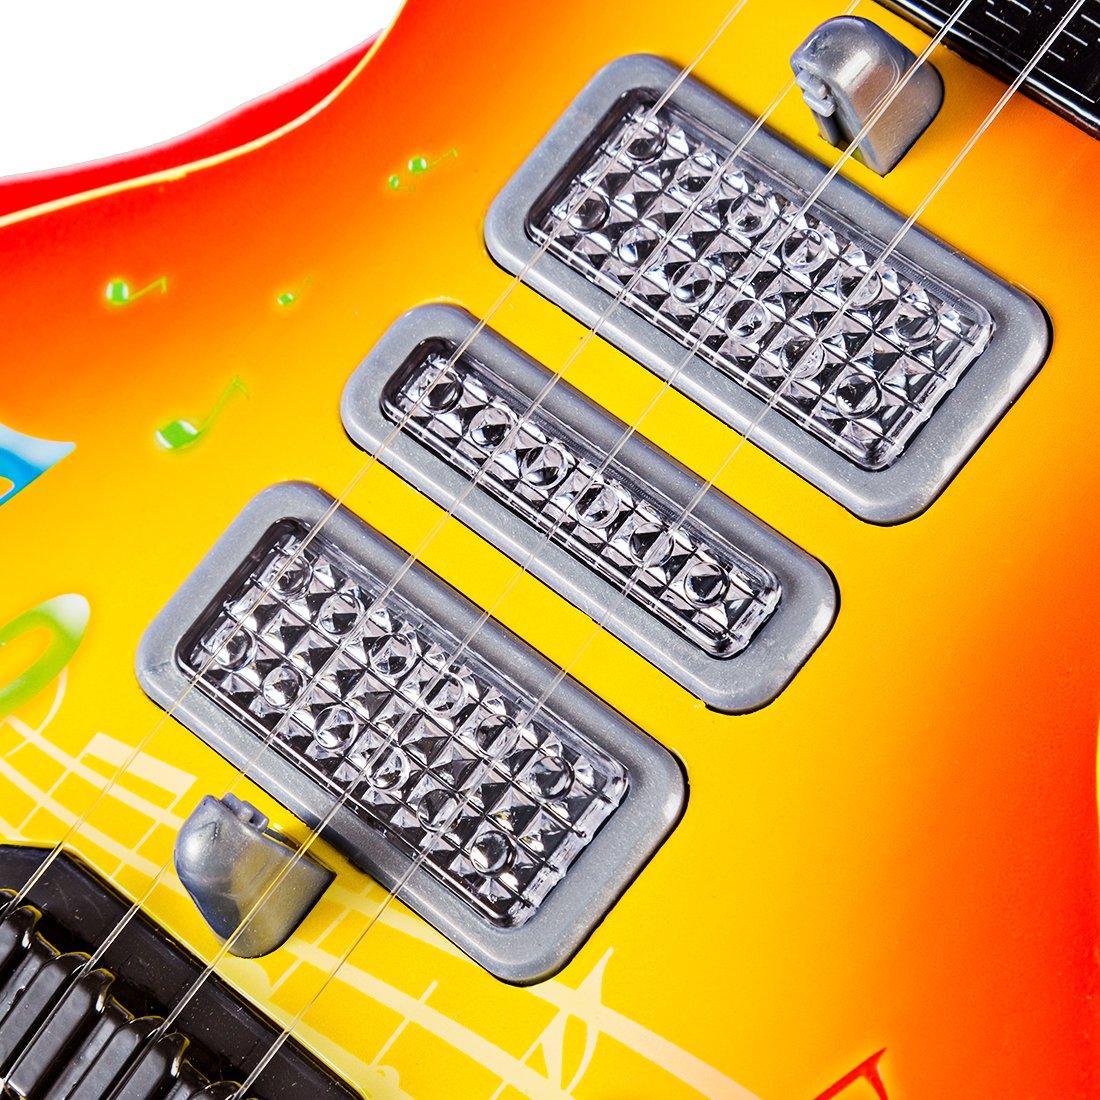 HMANE 4 Strings Electric Guitar Kids Musical Instruments ...